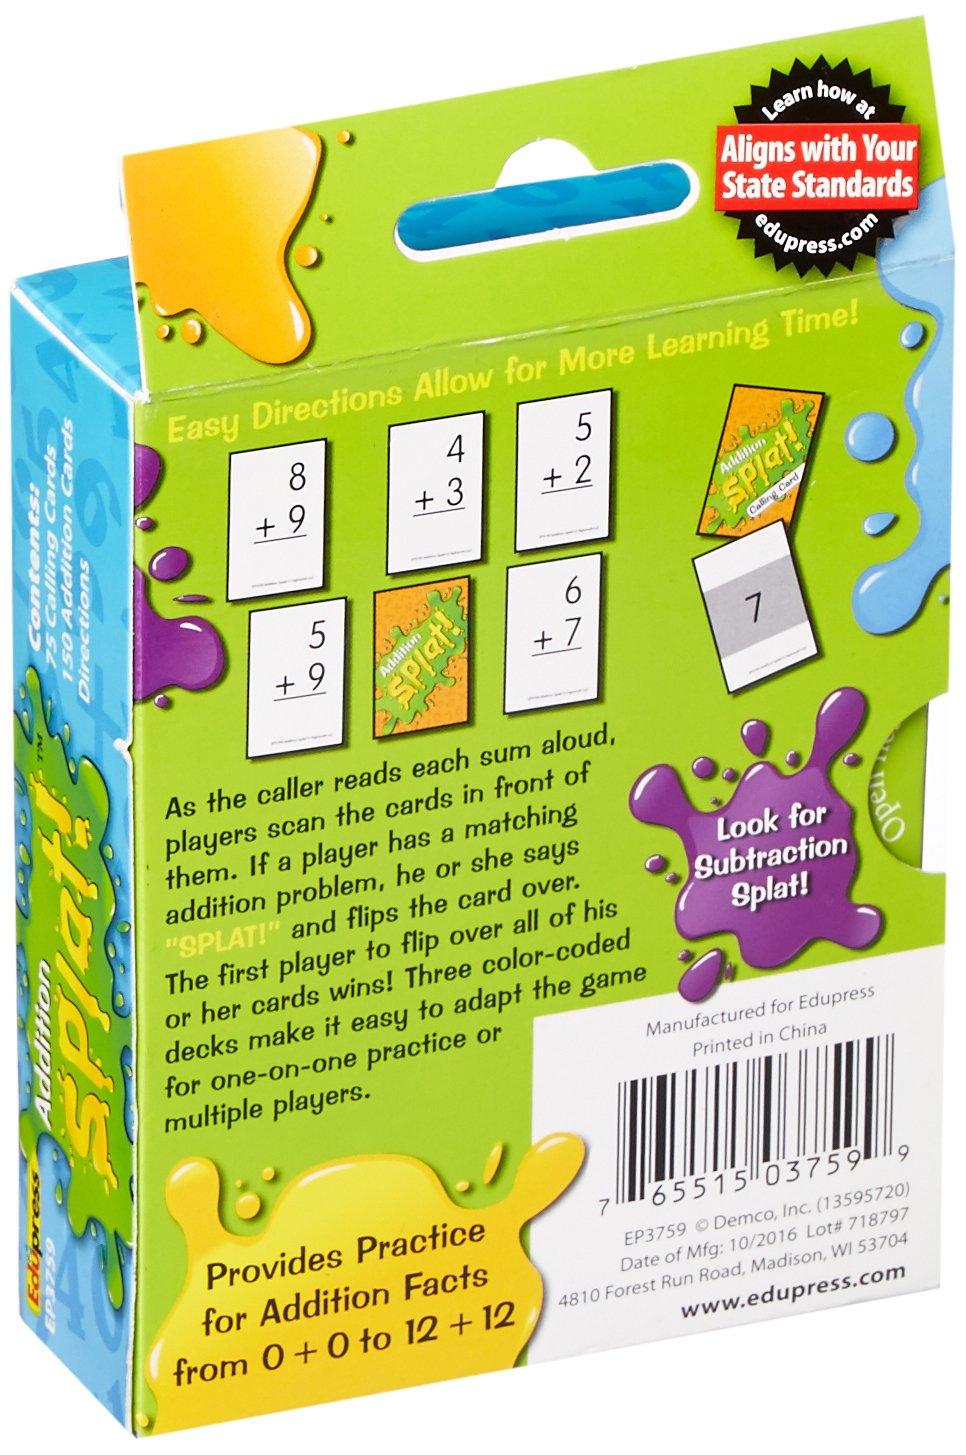 Amazon.com: Edupress Splat Game, Addition (EP63759): Office Products